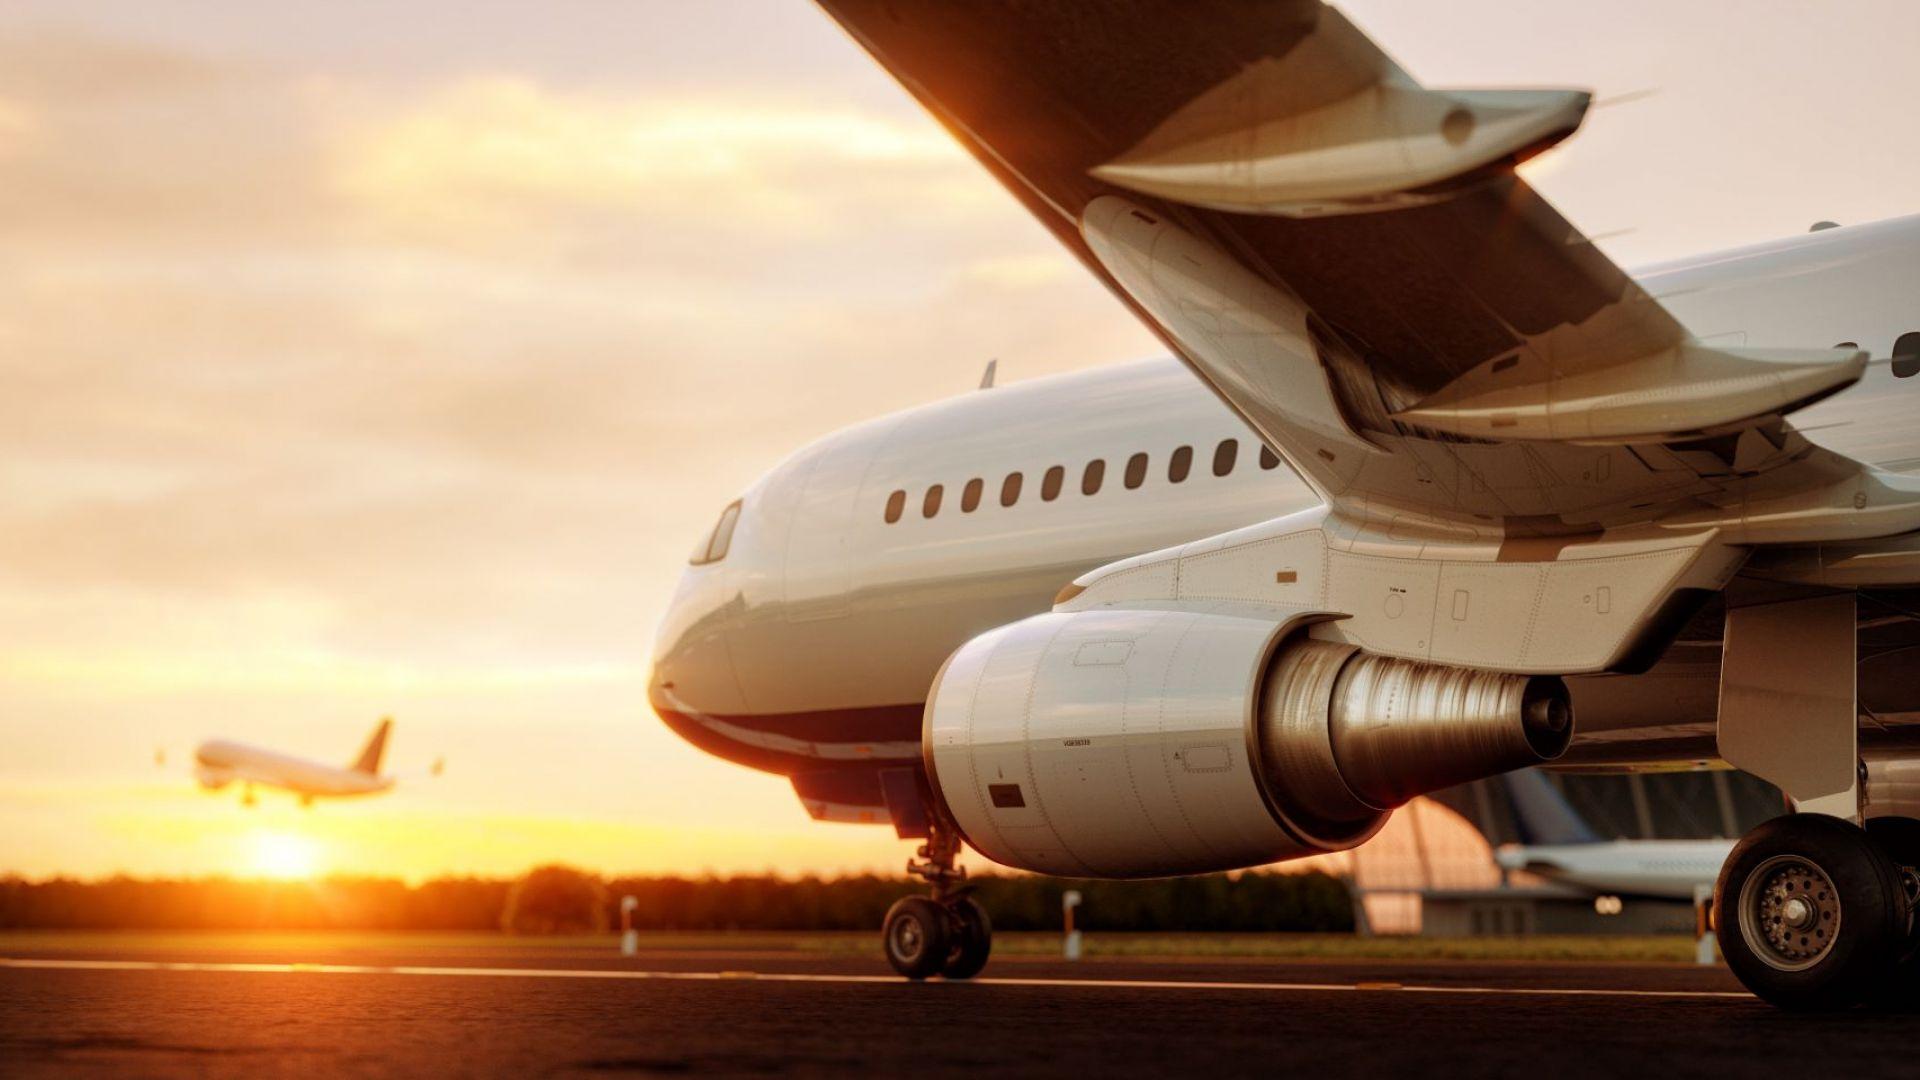 Мистериозен венецуелски правителствен самолет е кацнал тайно в Атина